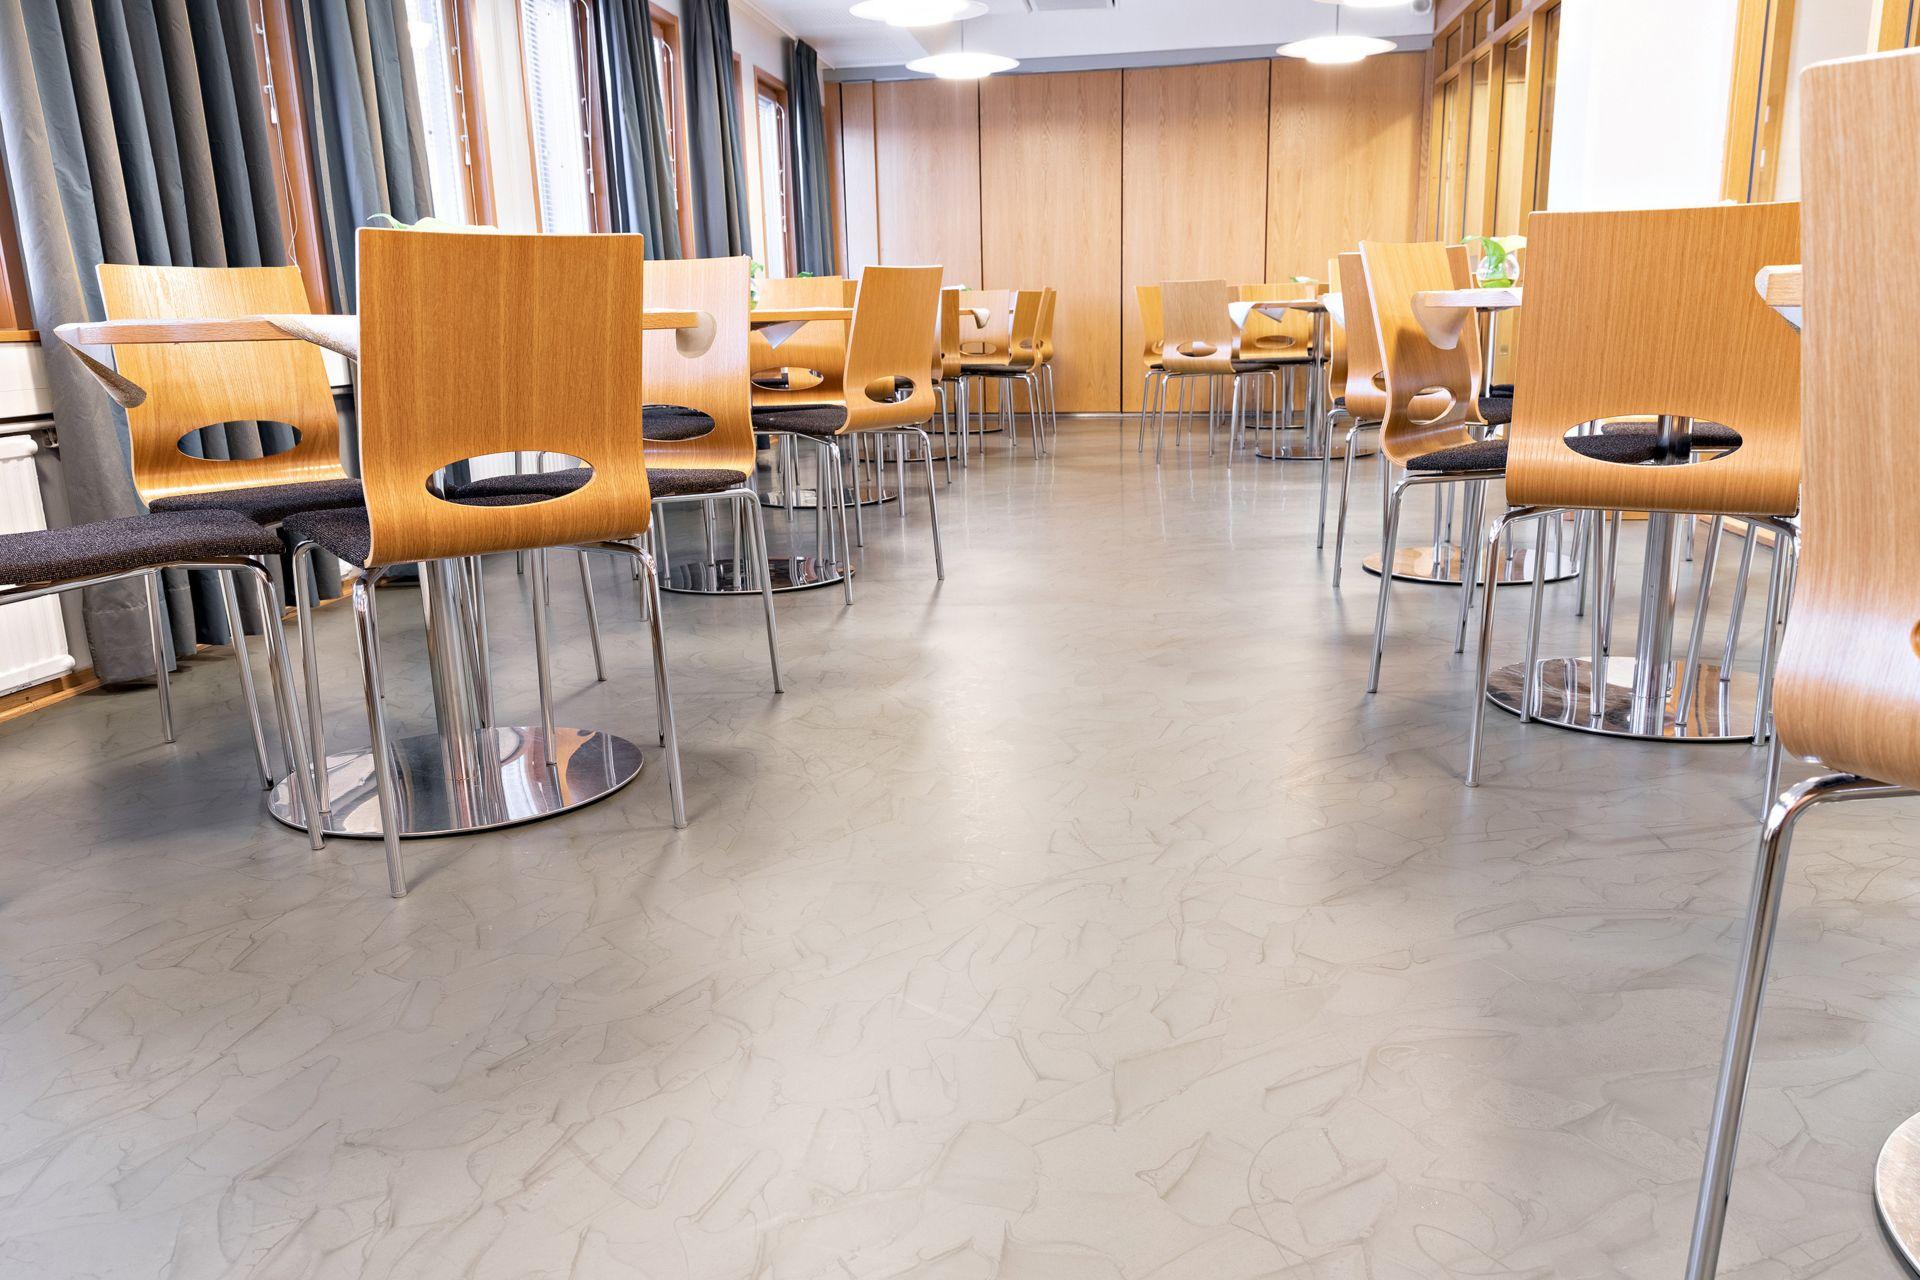 Sika Comfortfloor Marble FX Oulu